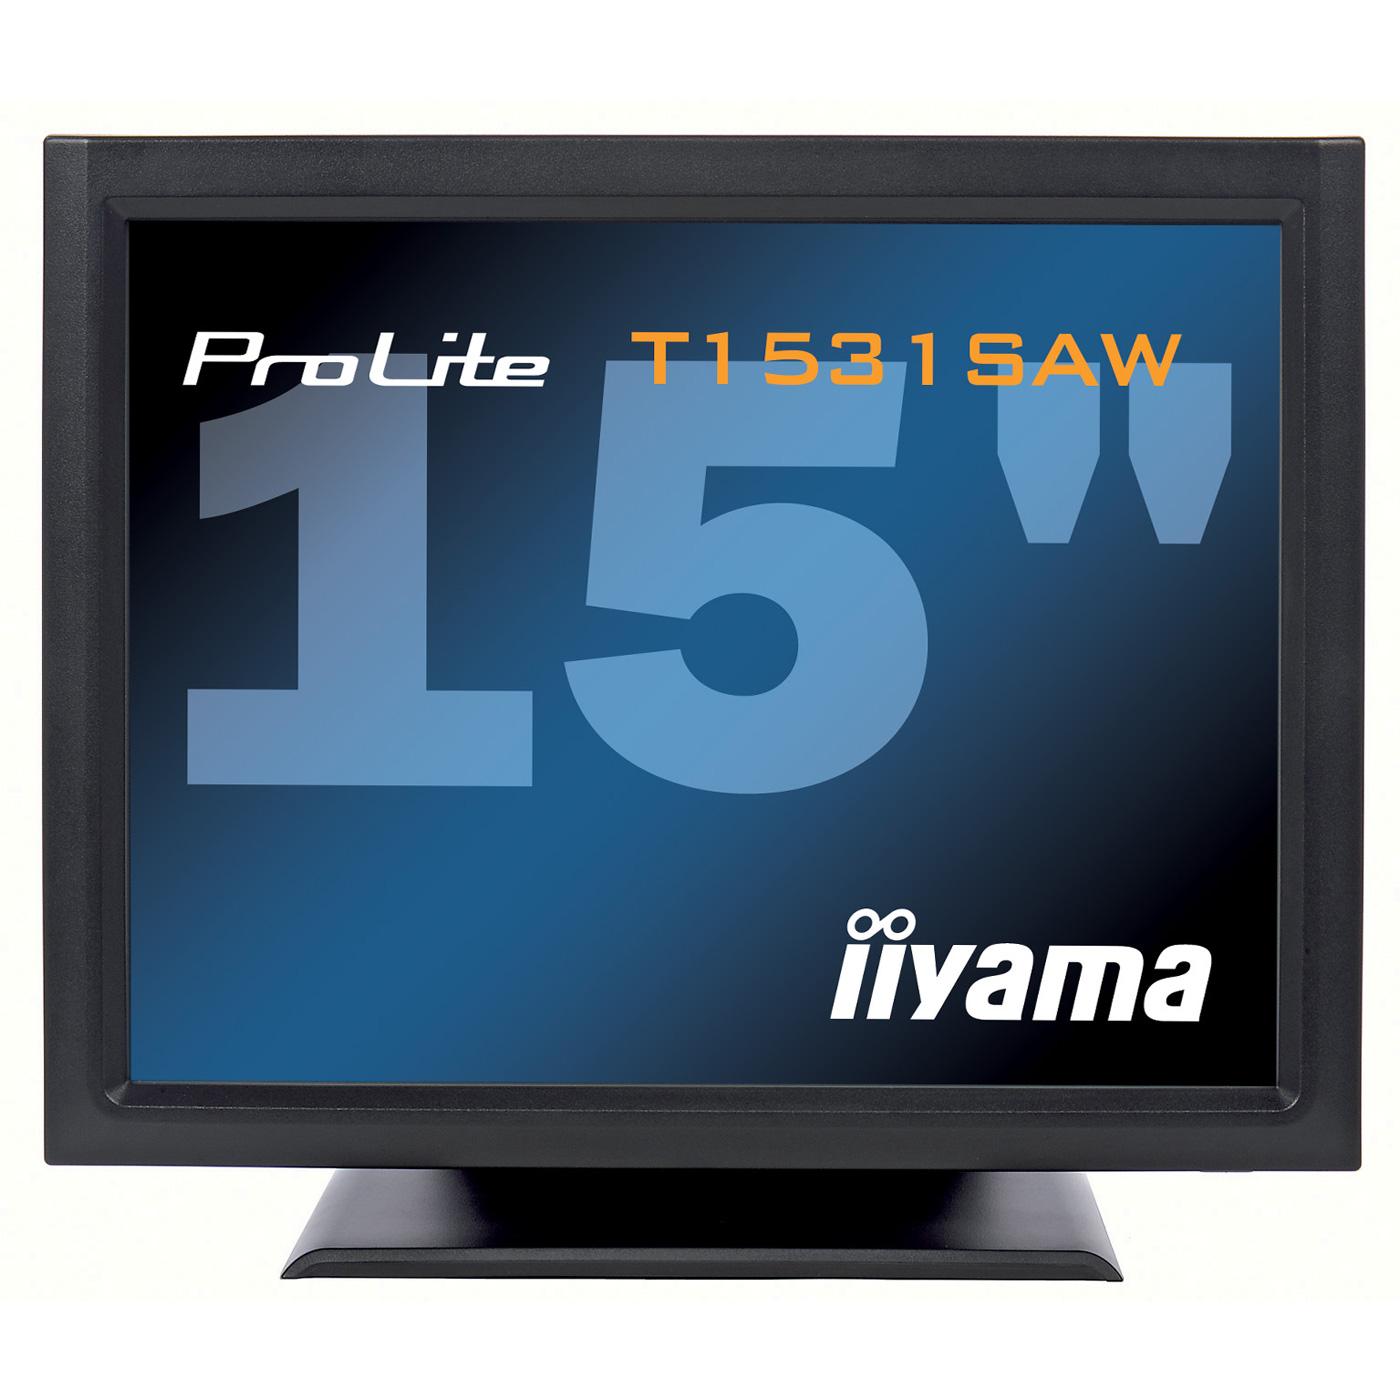 iiyama 15 lcd tactile prolite t1531saw 1 ecran pc iiyama sur. Black Bedroom Furniture Sets. Home Design Ideas